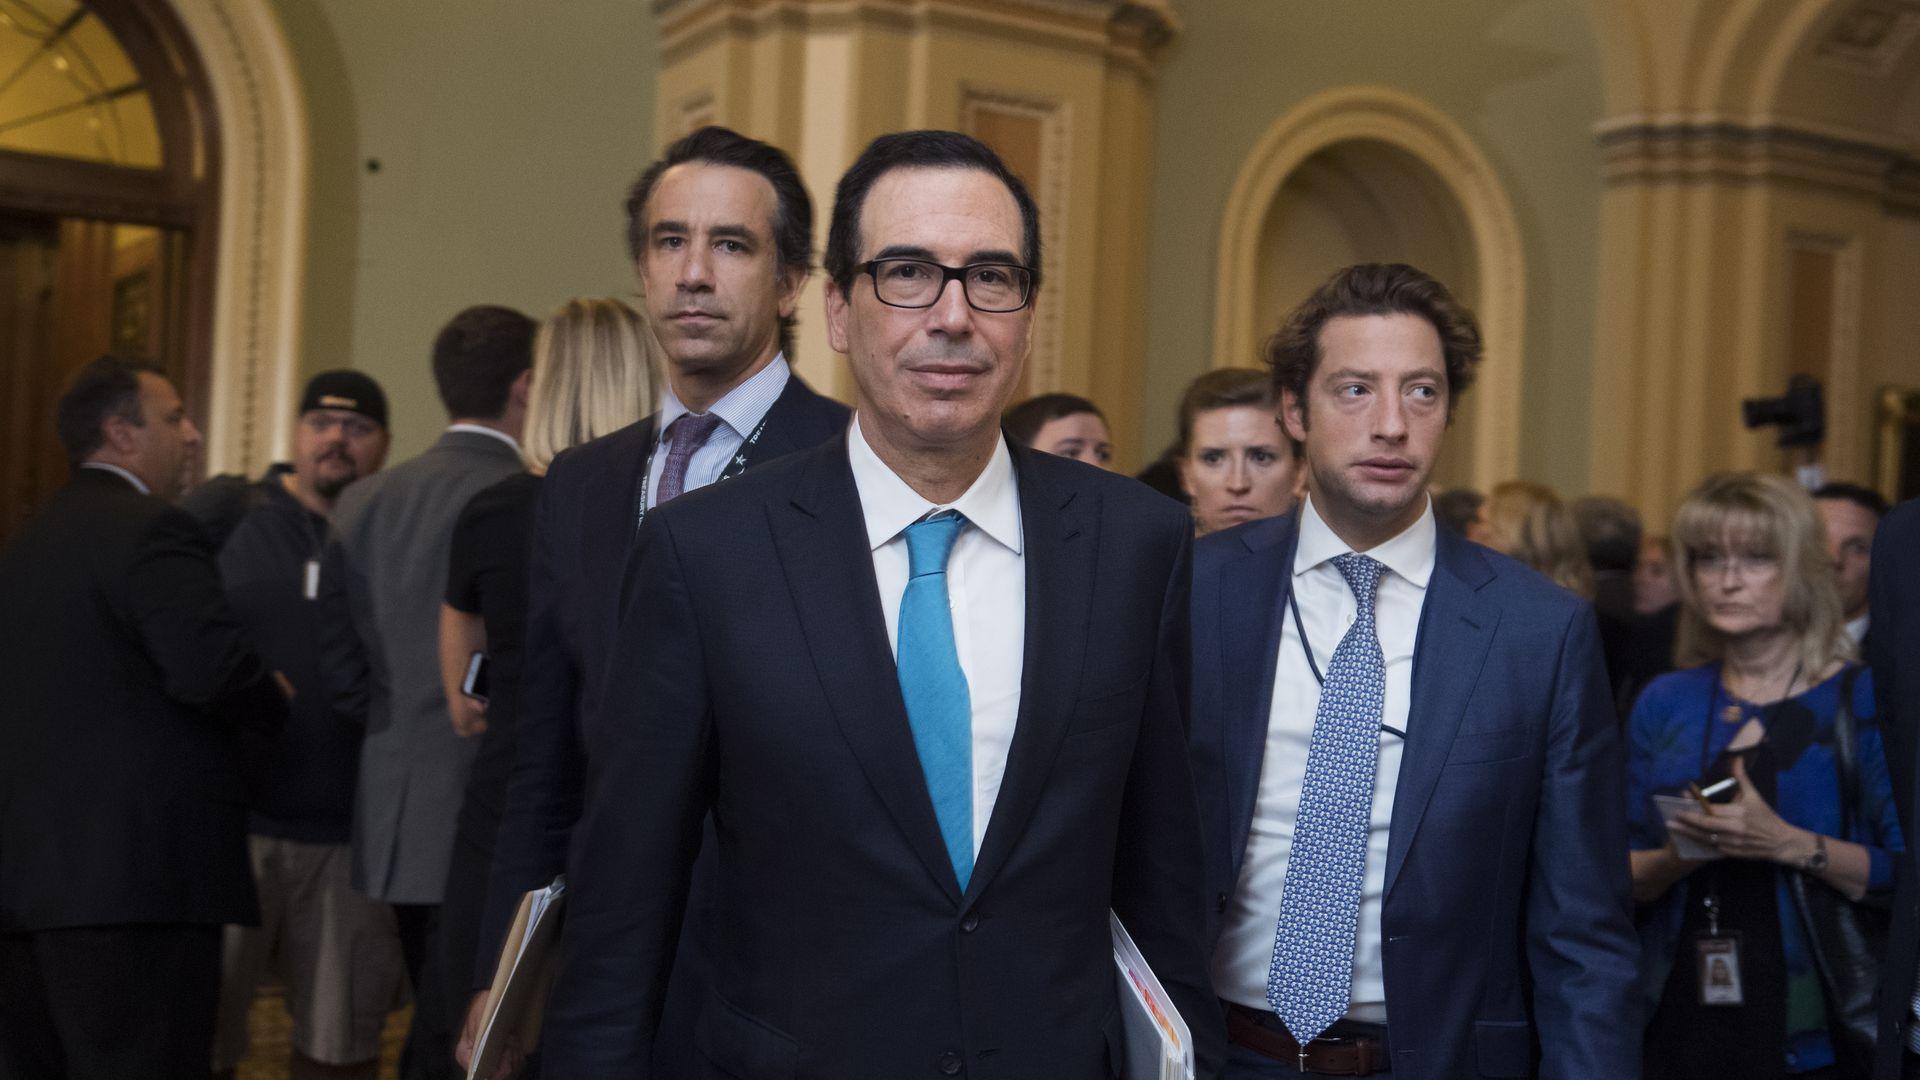 Treasury secretary Steven Mnuchin wearing black suit.